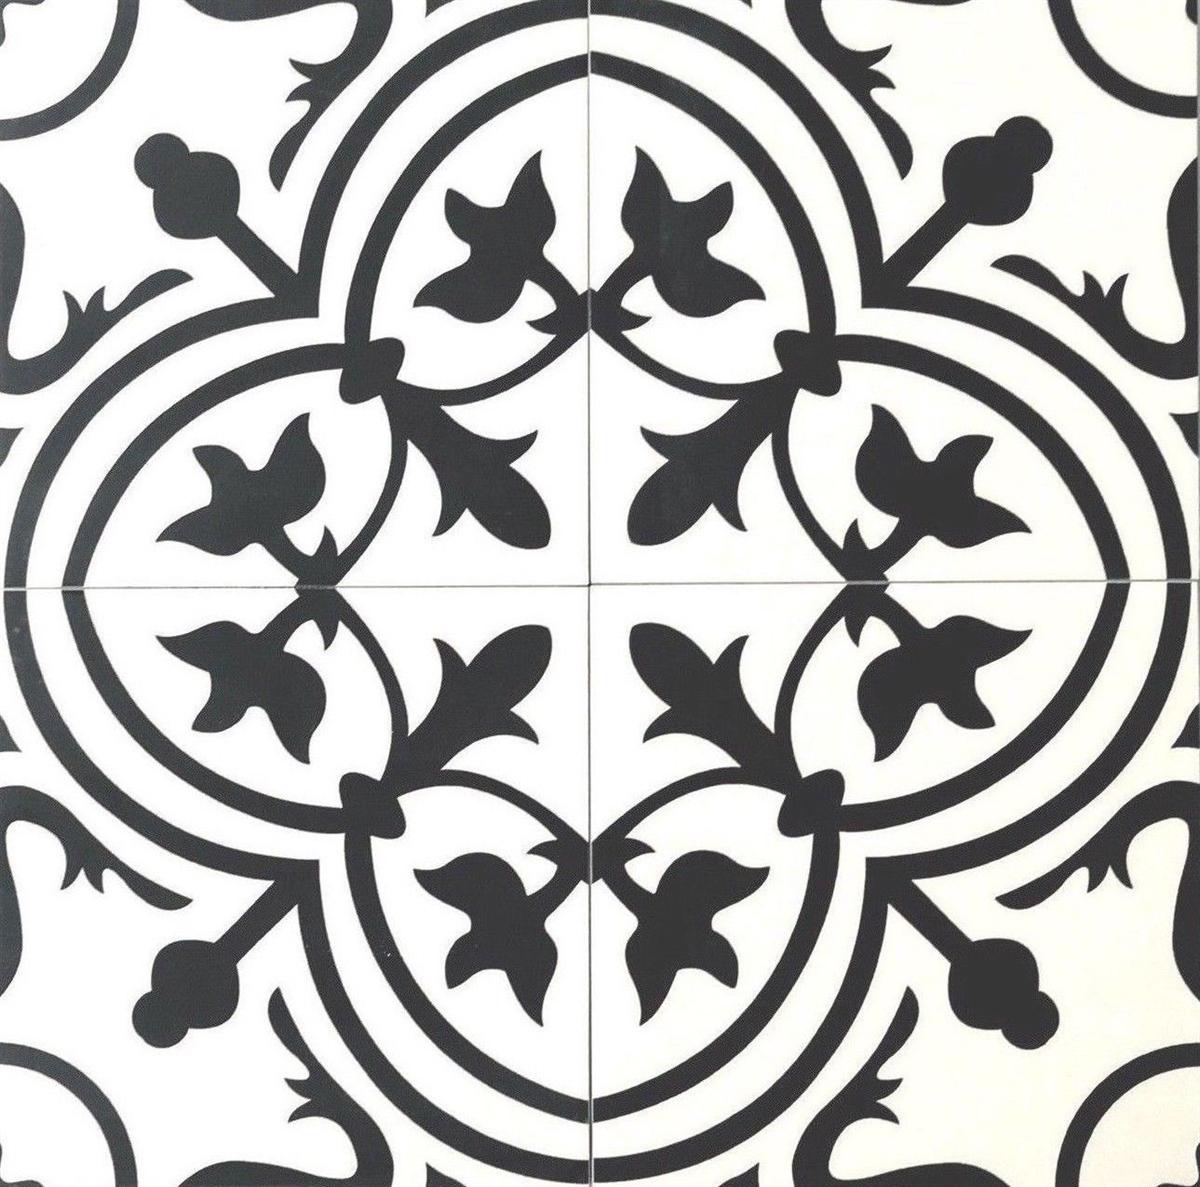 8x8 flora black white porcelain floor and wall tile